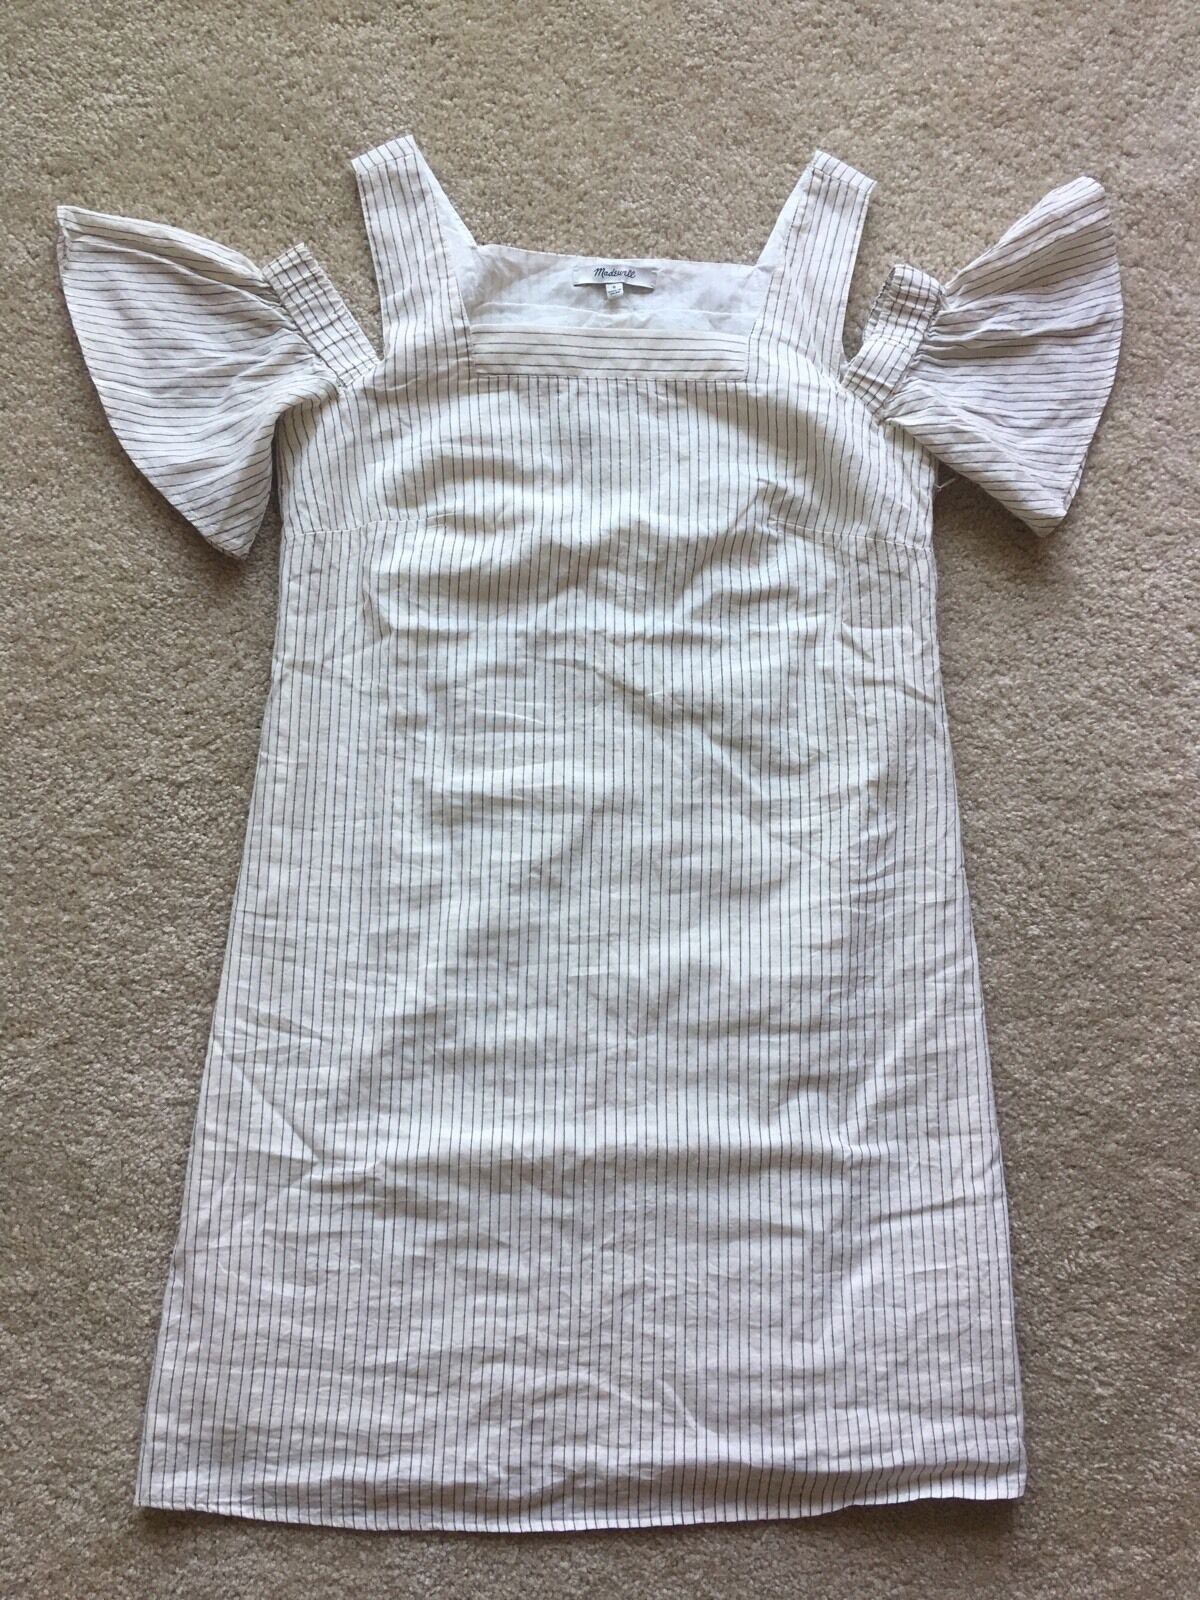 Authentic Madewell striped cold-shoulder dress Größe 2, bleached linen